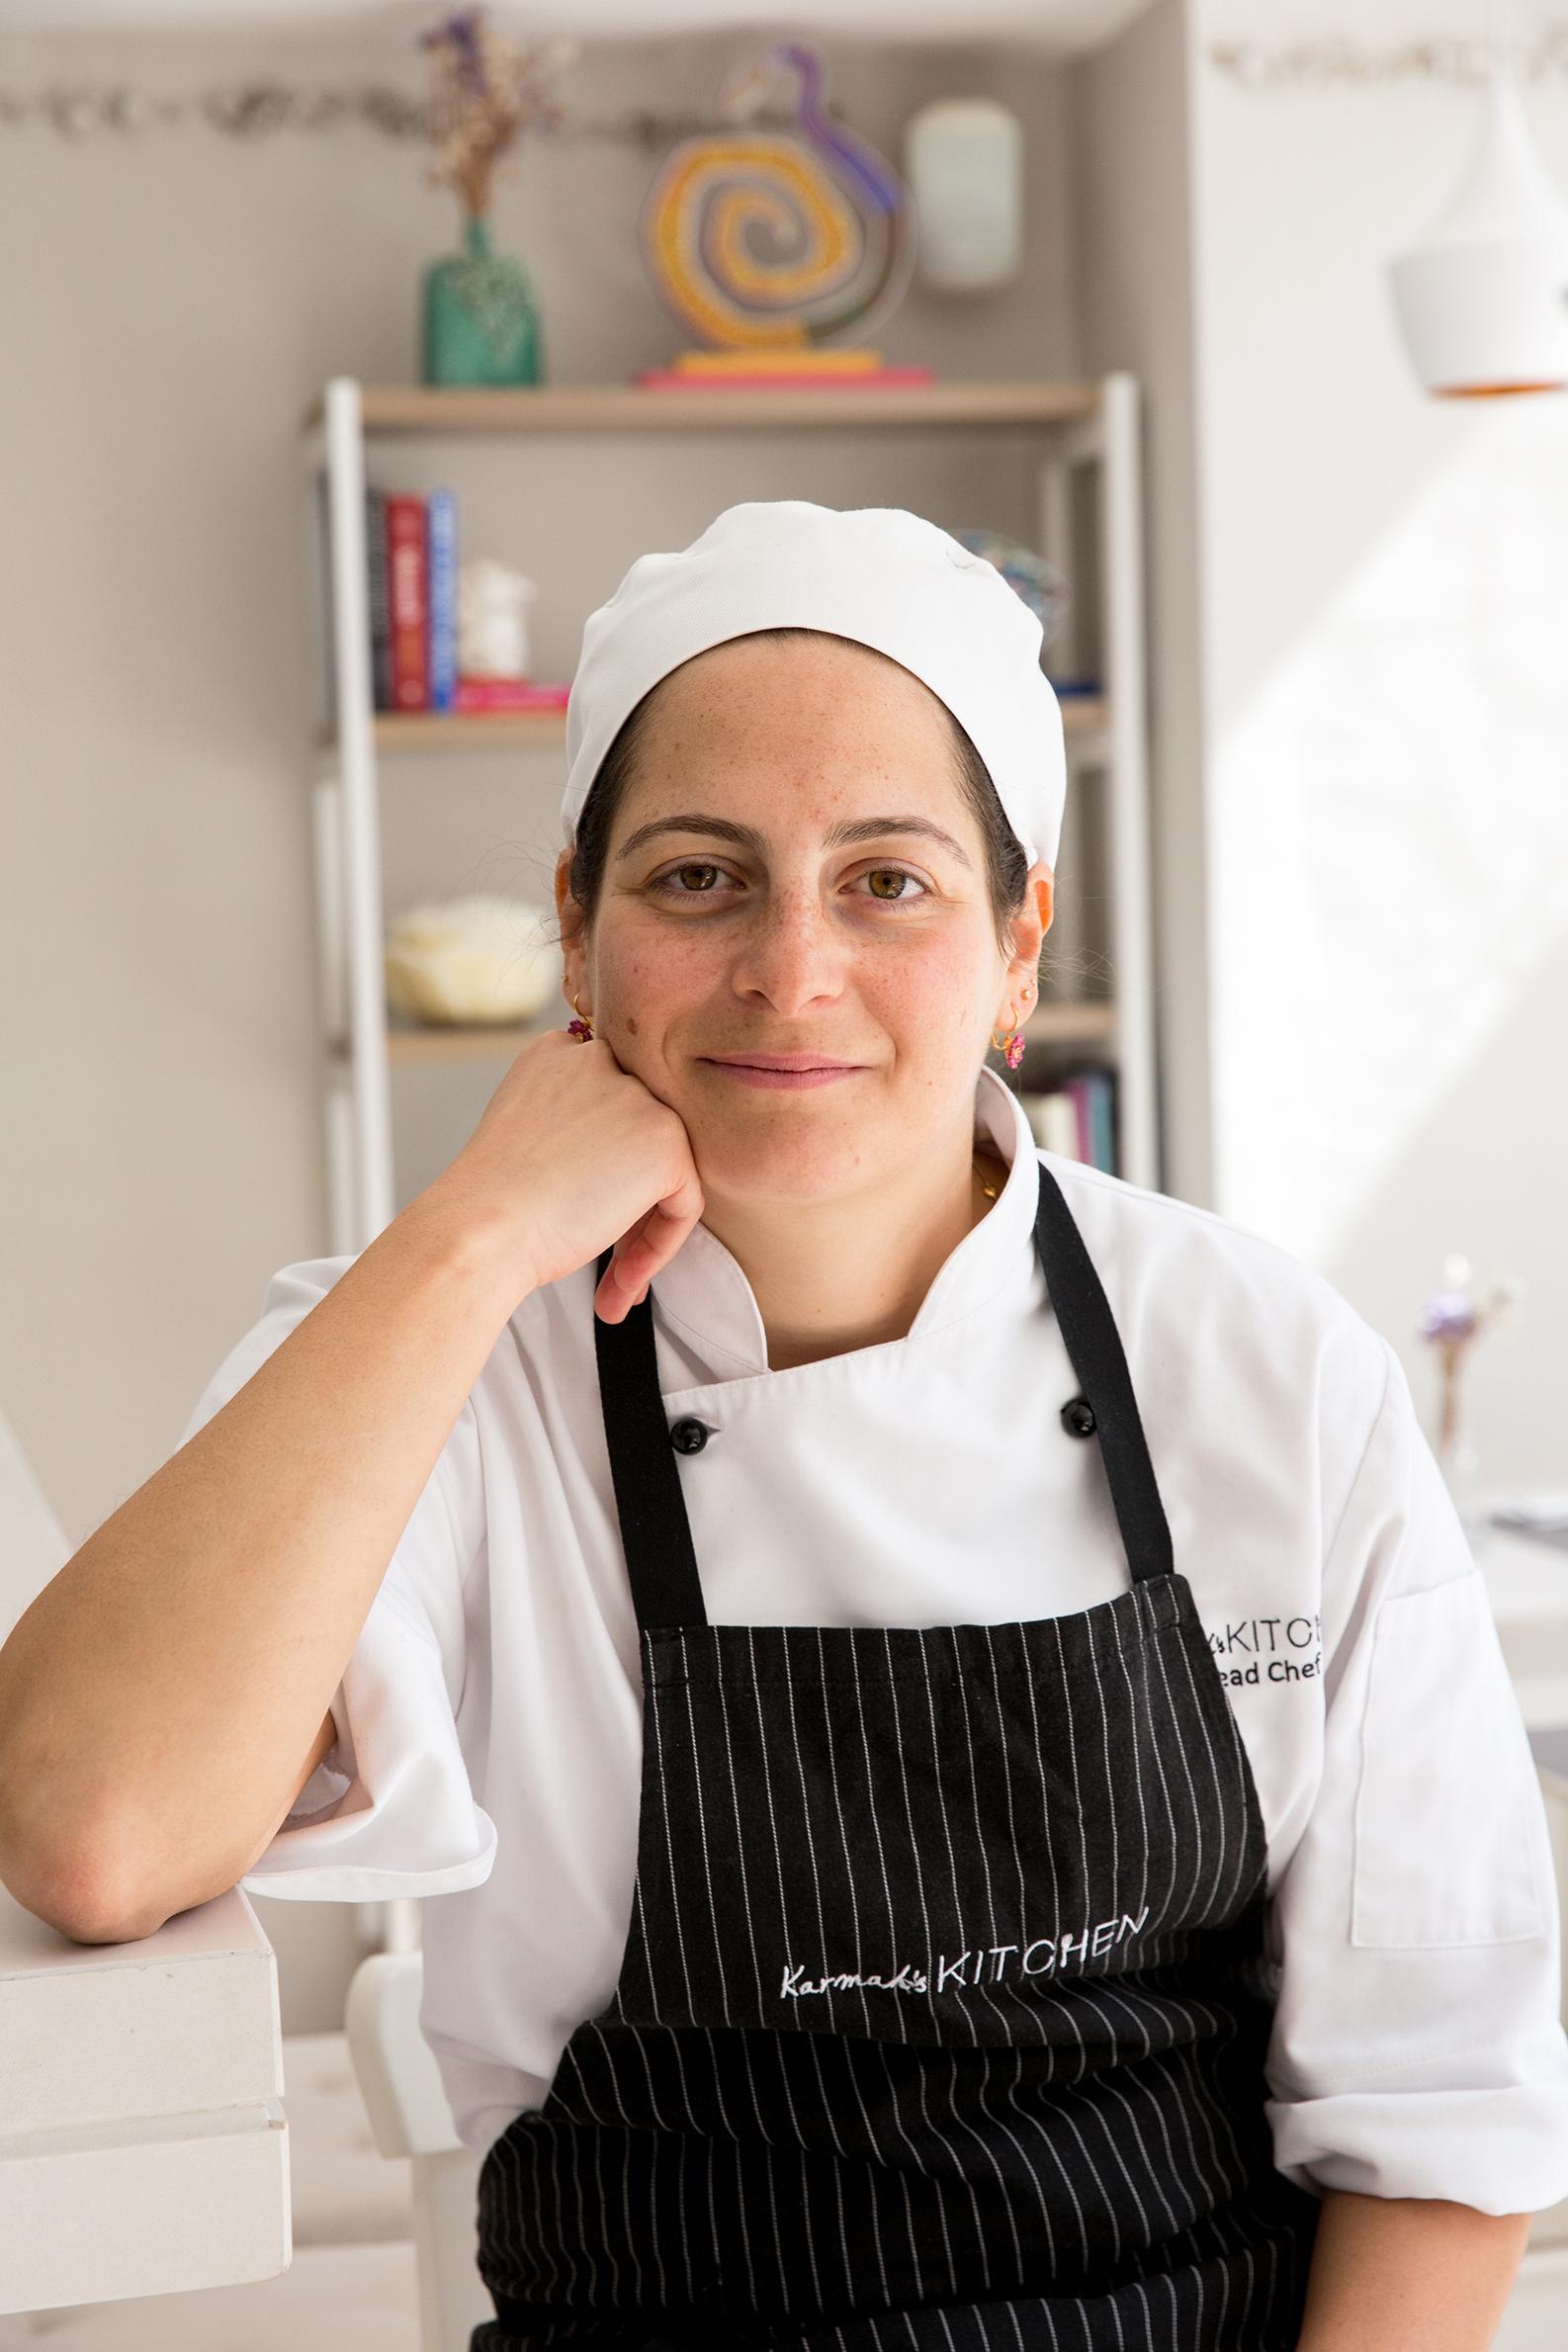 chef-karmah-by-nathalie-tufinkijian